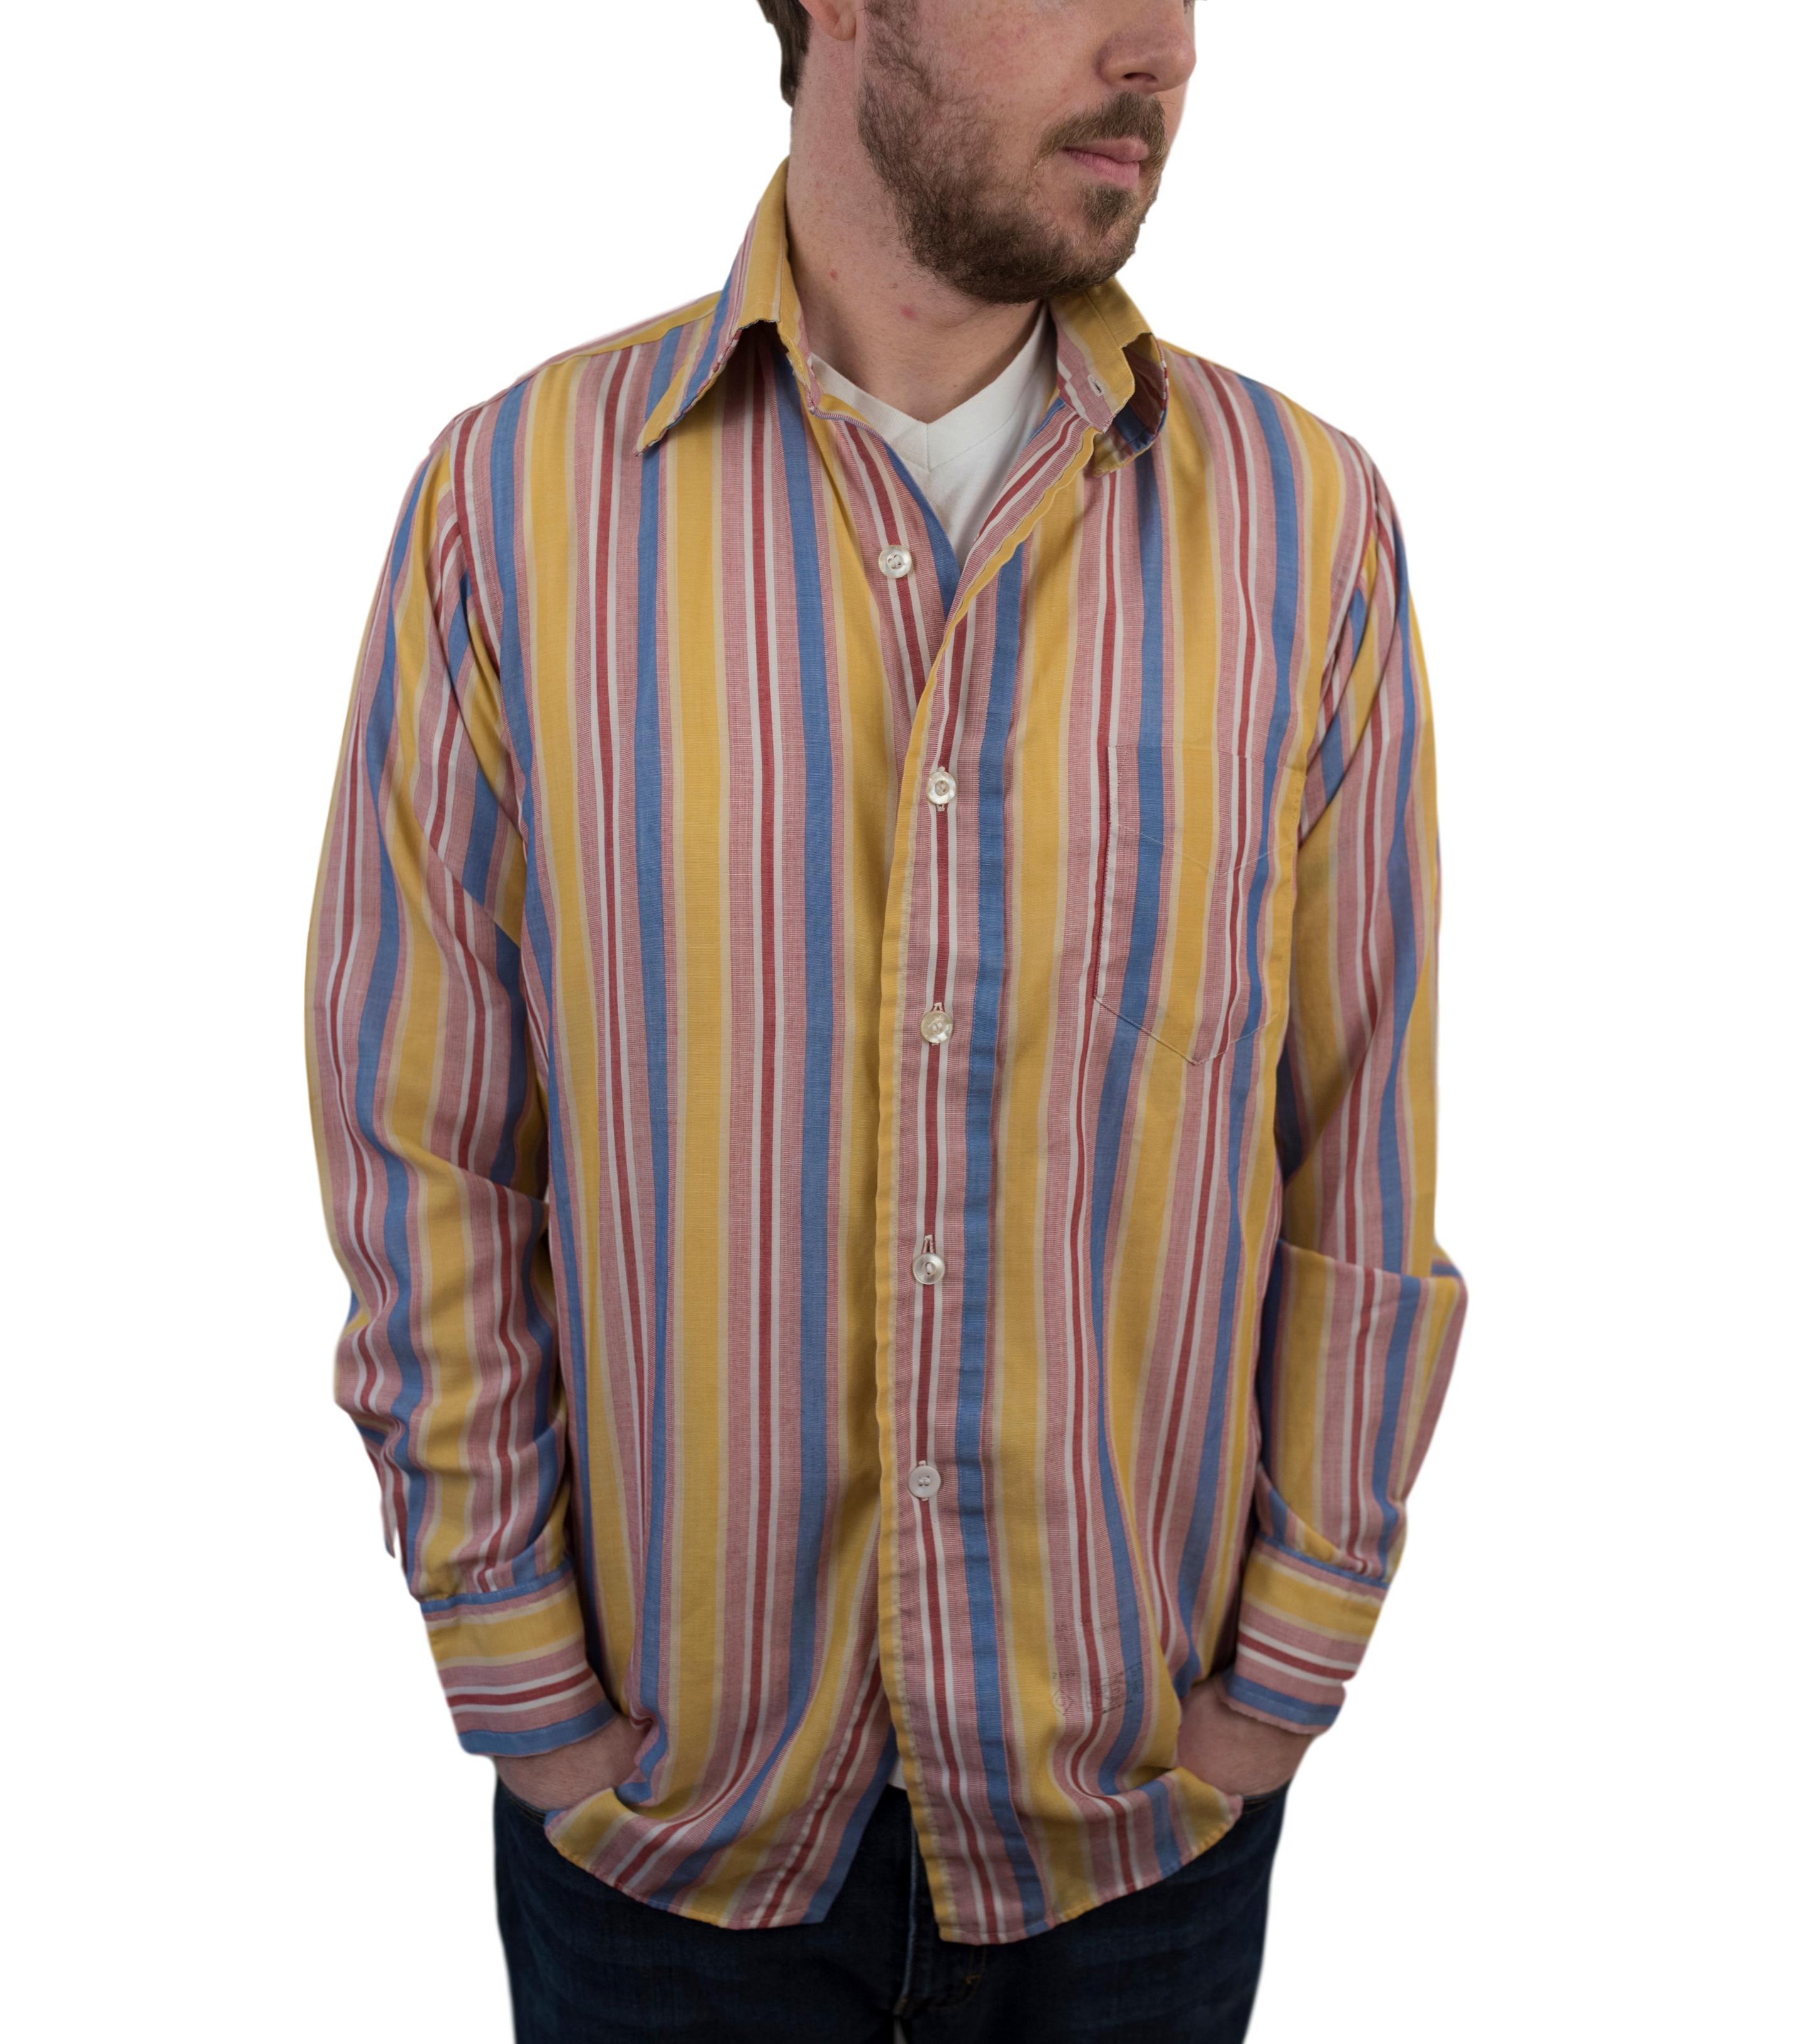 61a7e4f6f5 Vintage × Gant × Streetwear. Vintage 60s Gant Mens Long Sleeve Dress Shirt  ...